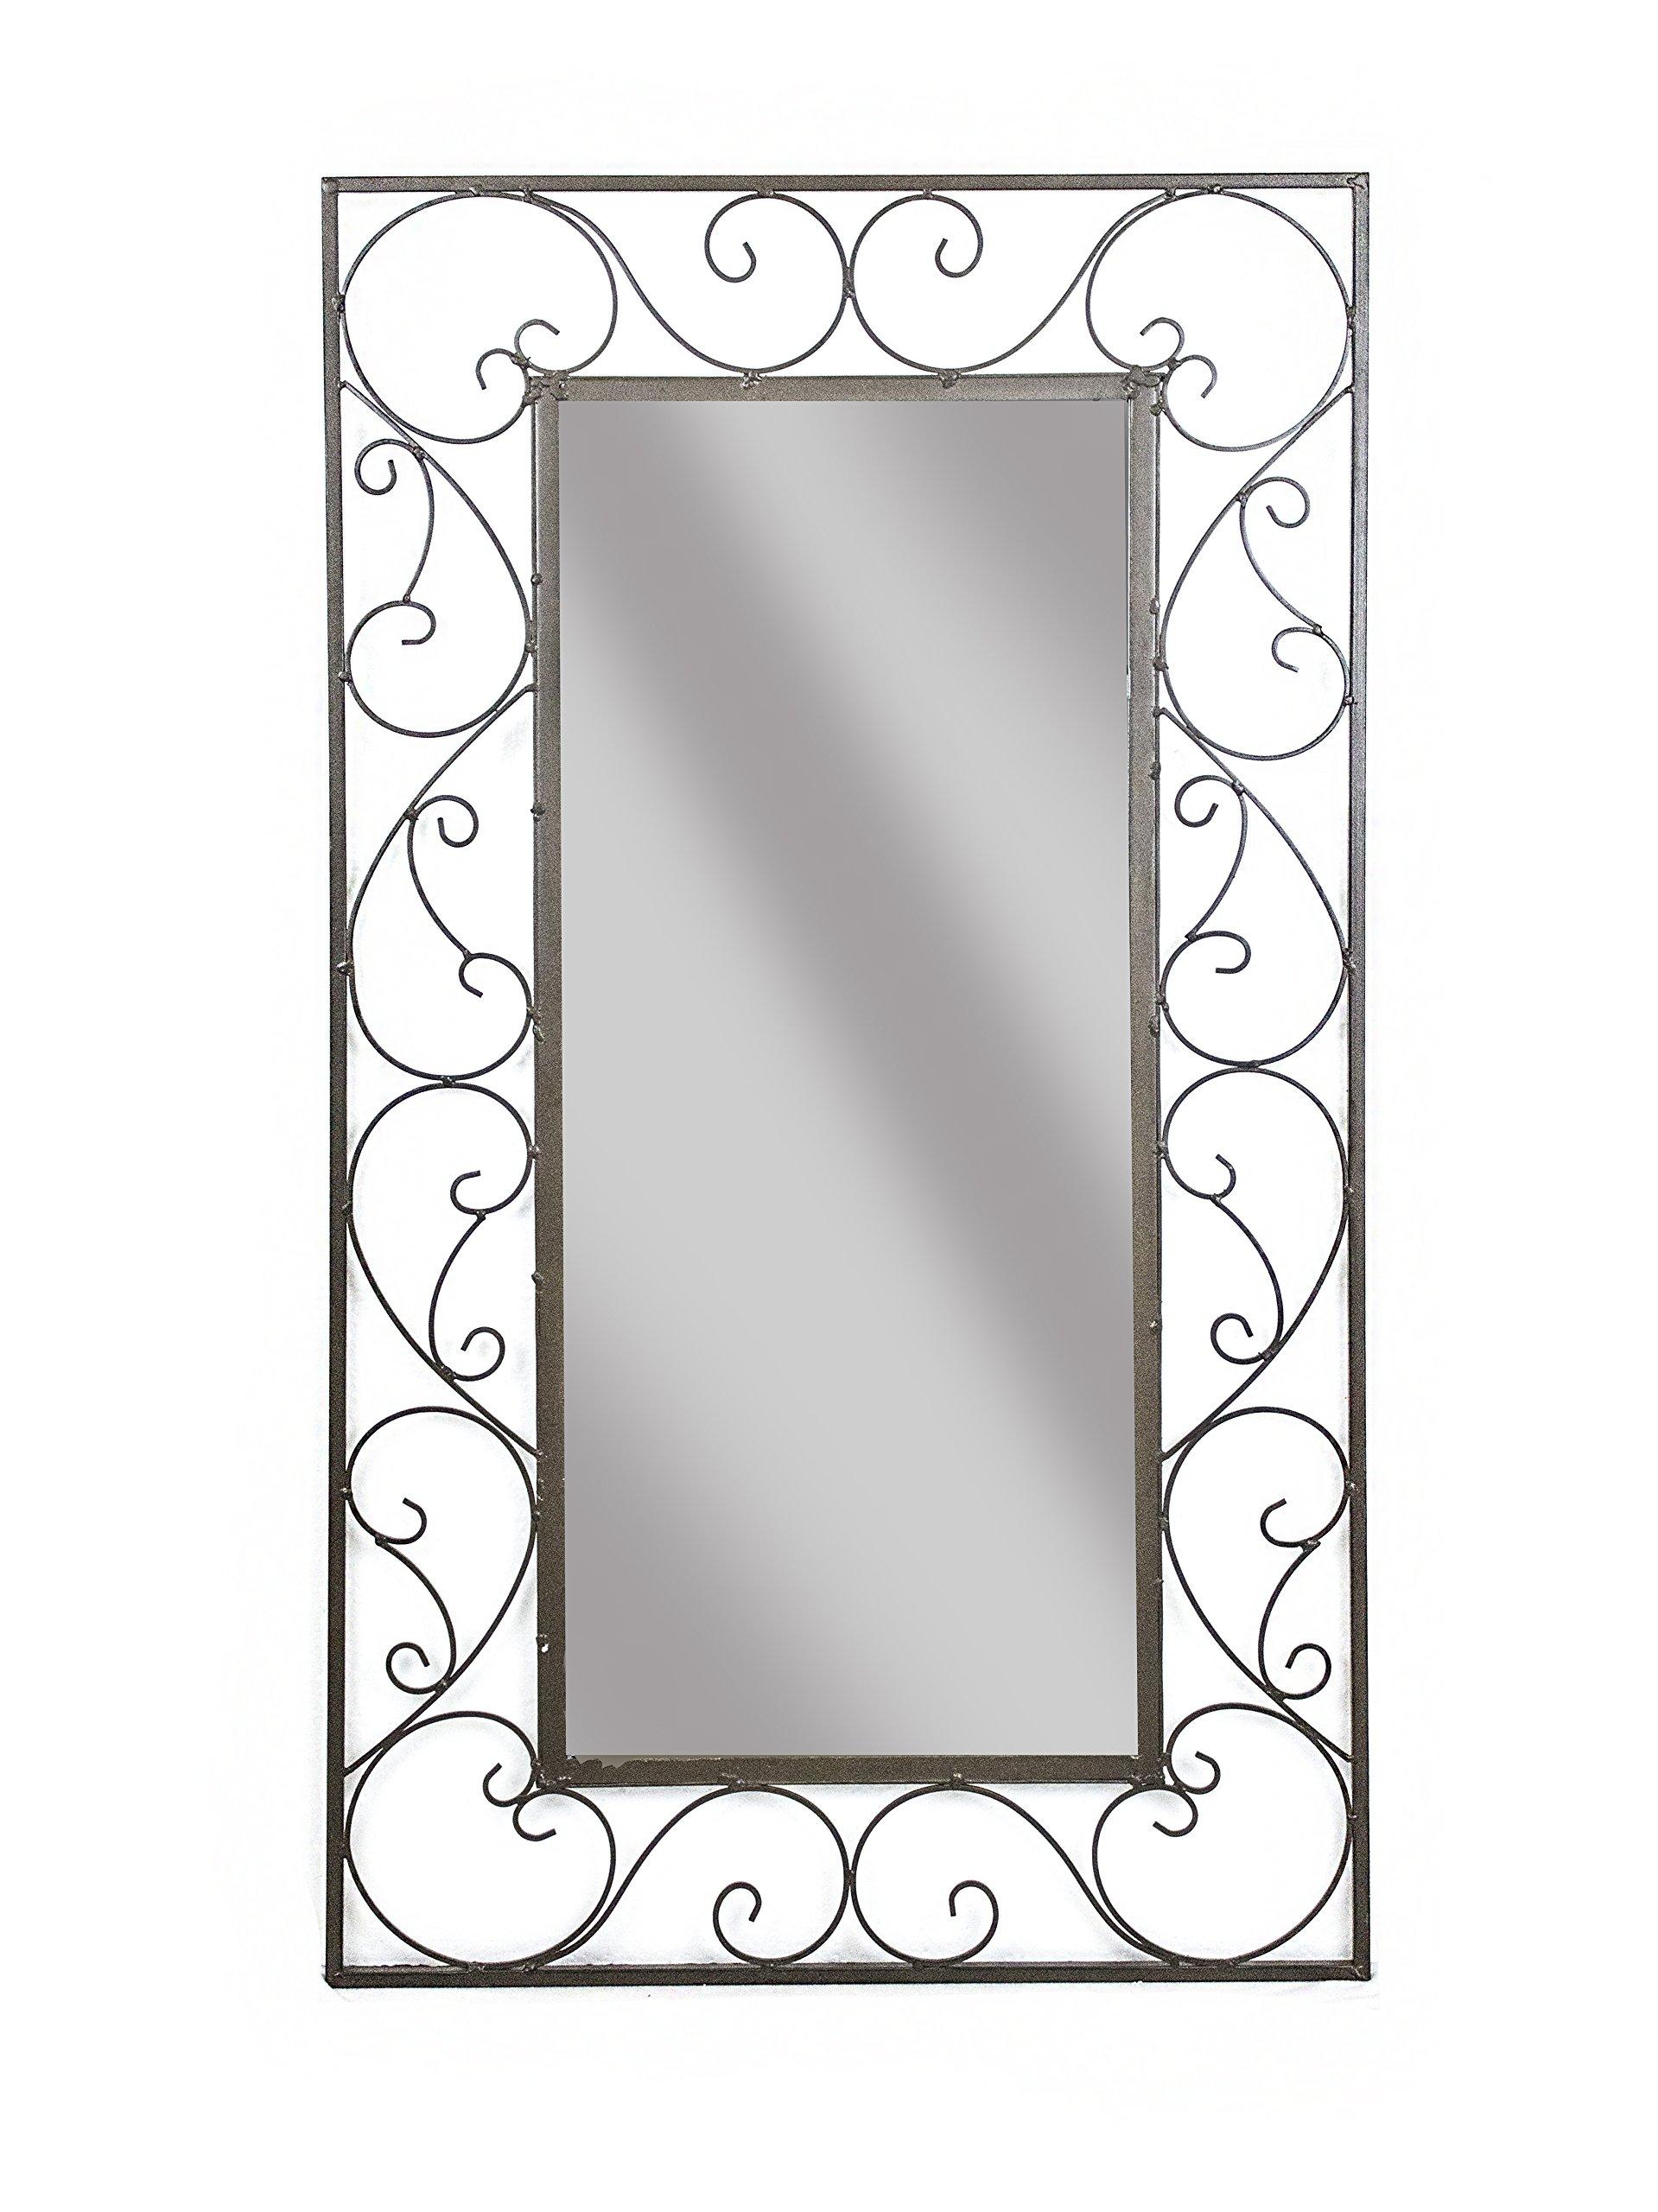 Sagebrook Home WM10333-01 Scroll Wall Mirror, Black Metal, 19.75 x 0.25 x 35.5 Inches